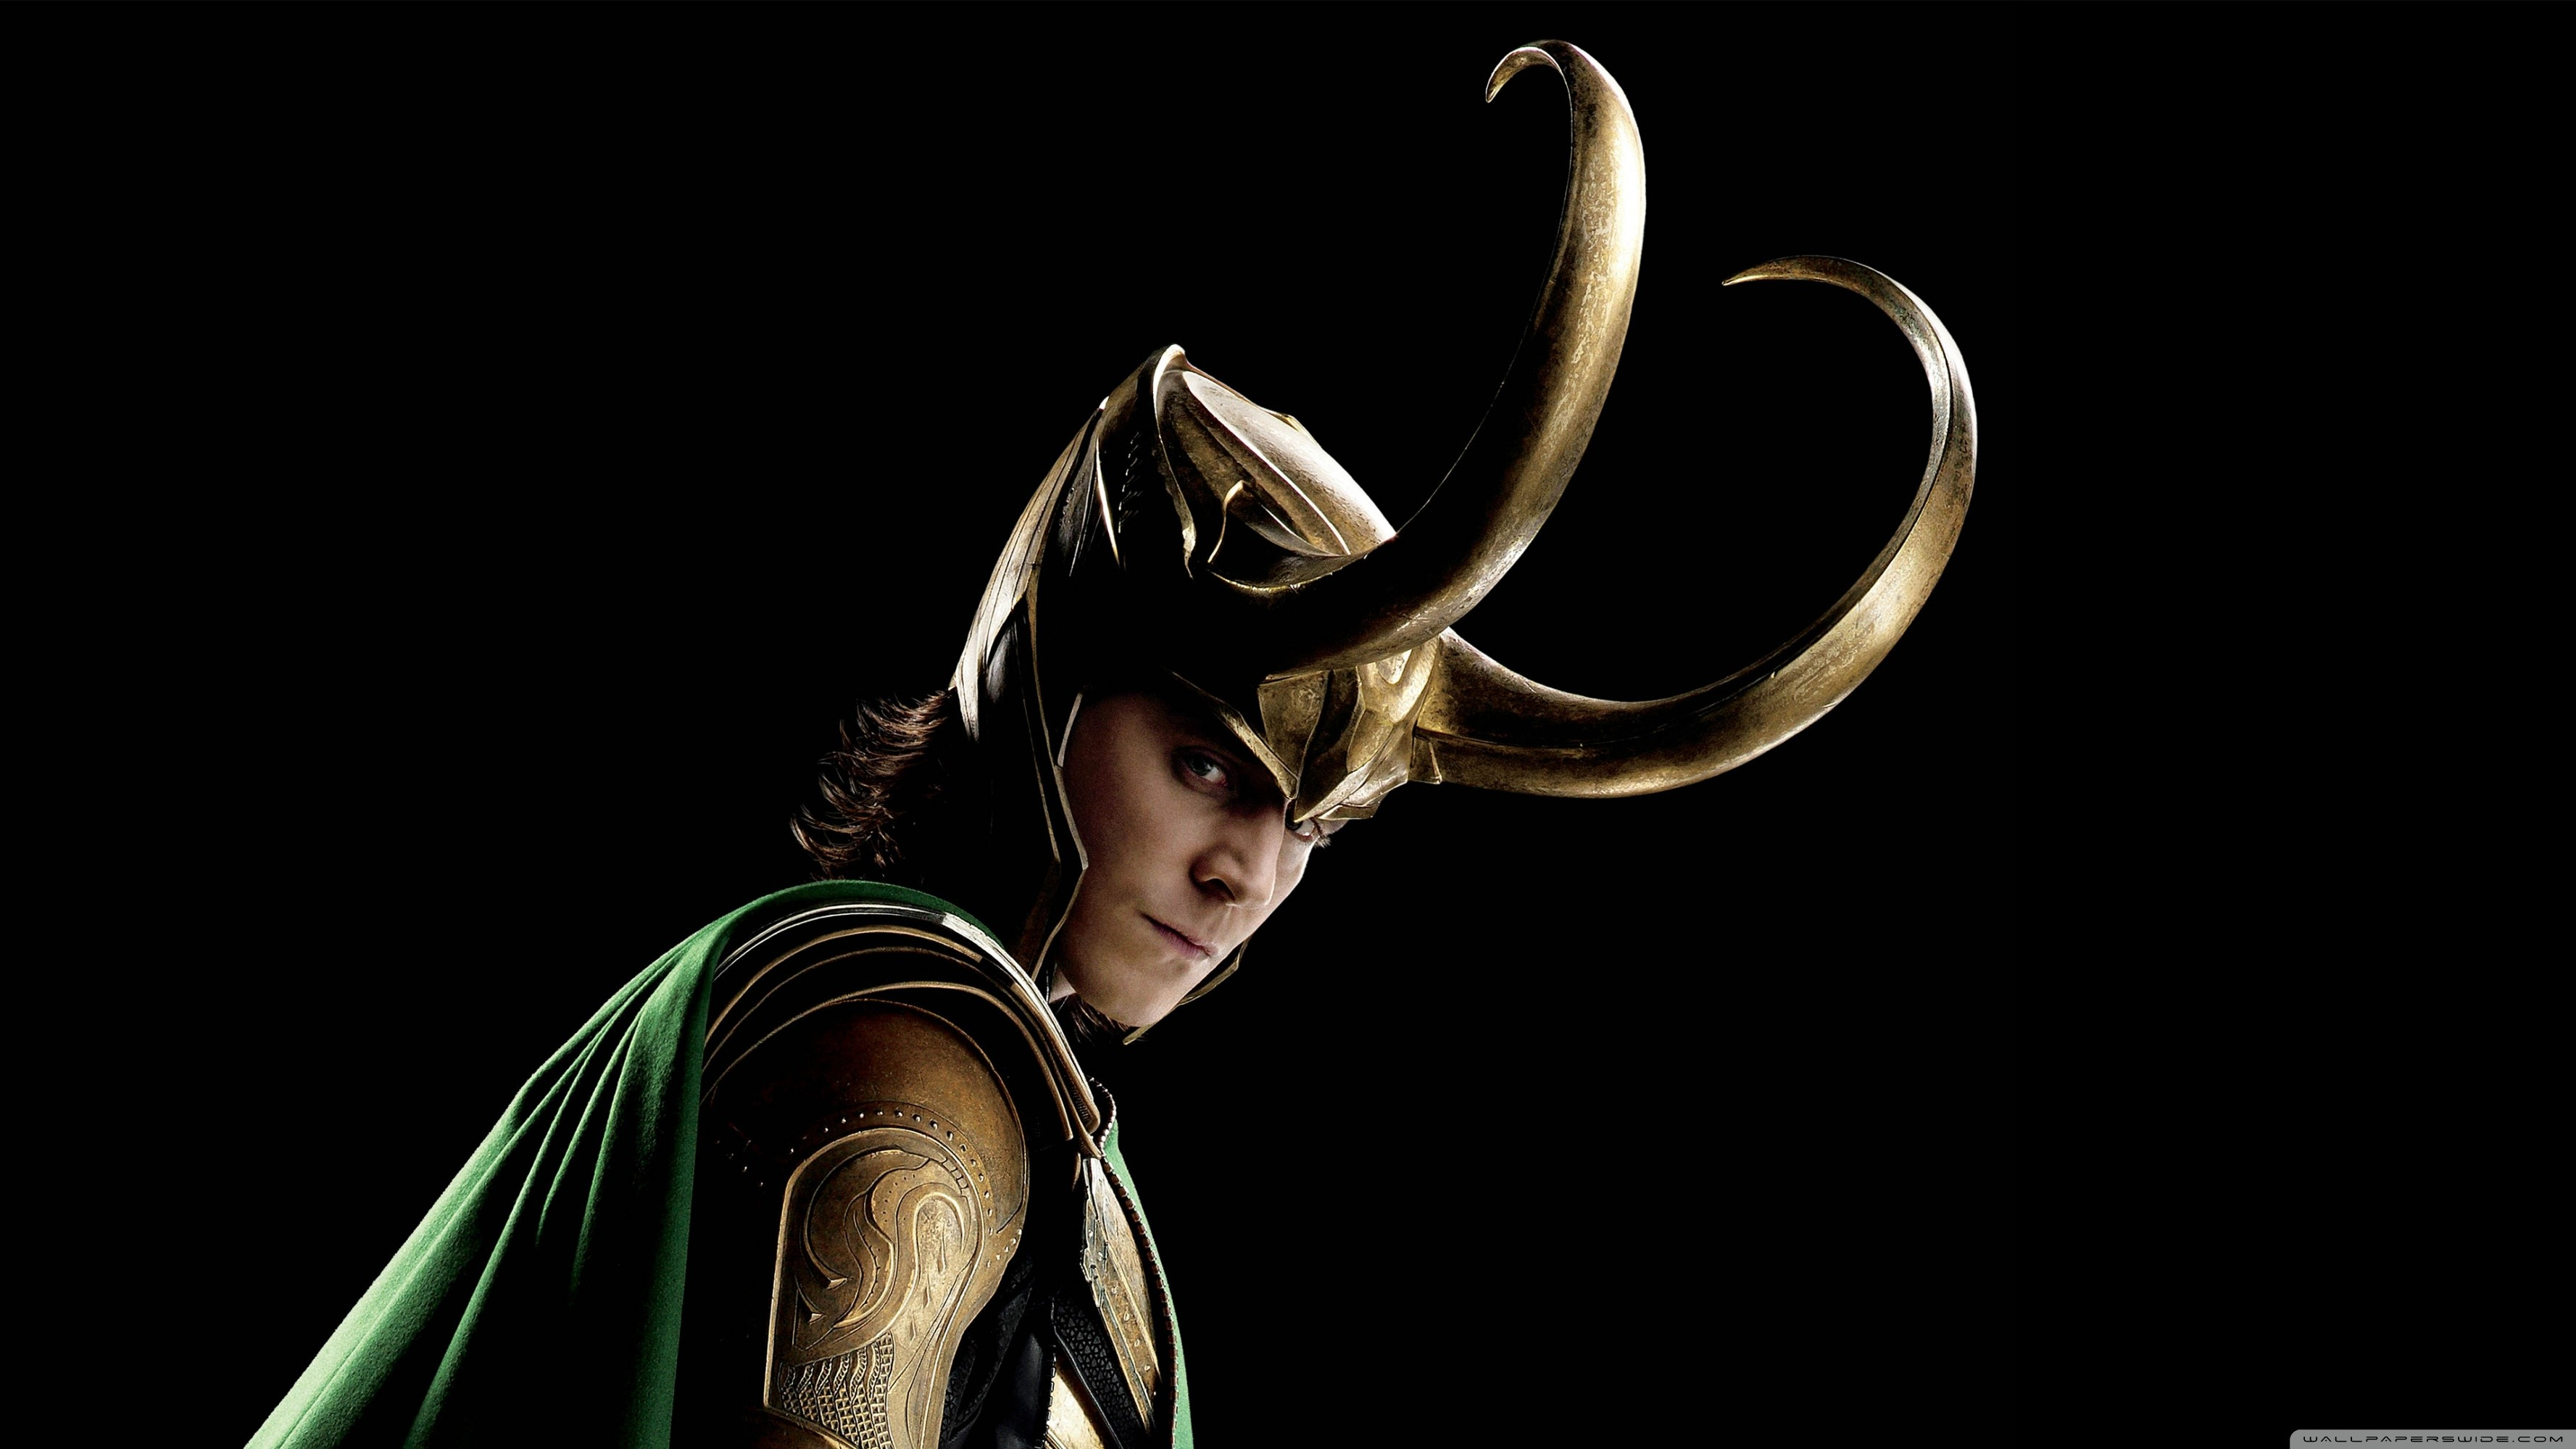 Loki Wallpapers HD (71+ images)